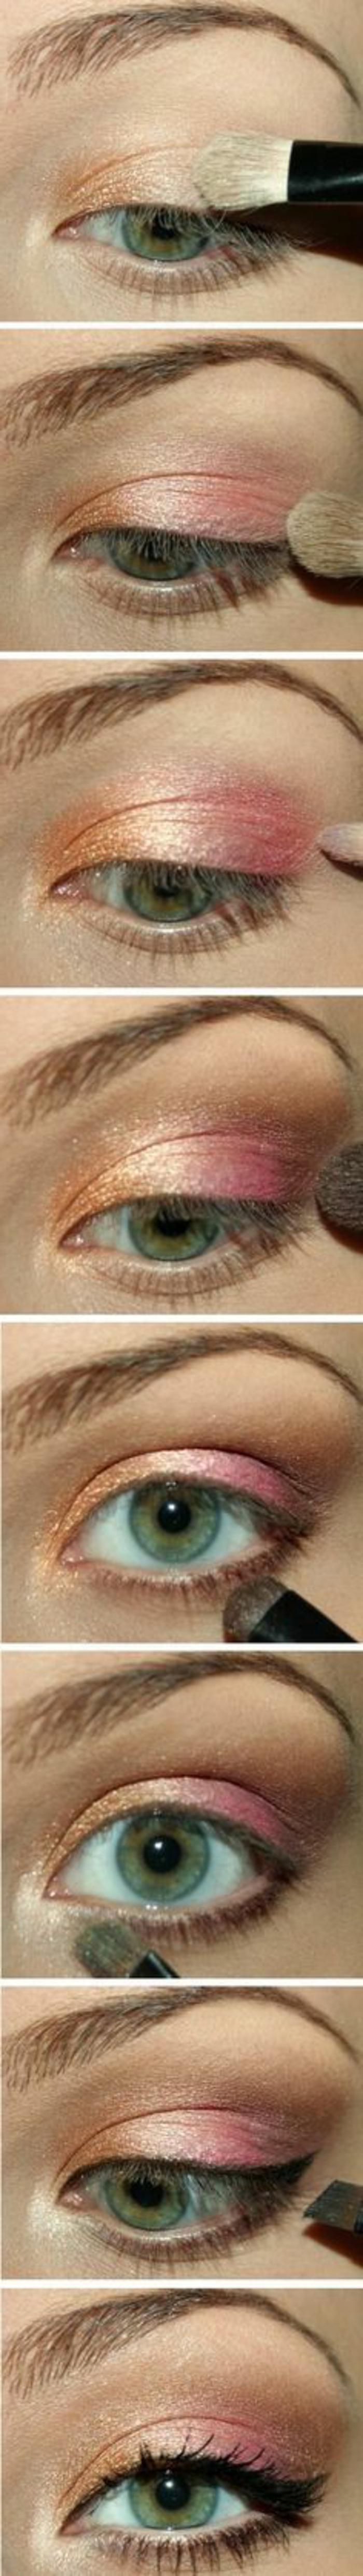 tutoriel-maquillage-rose-doré-orange-yeux-bleus